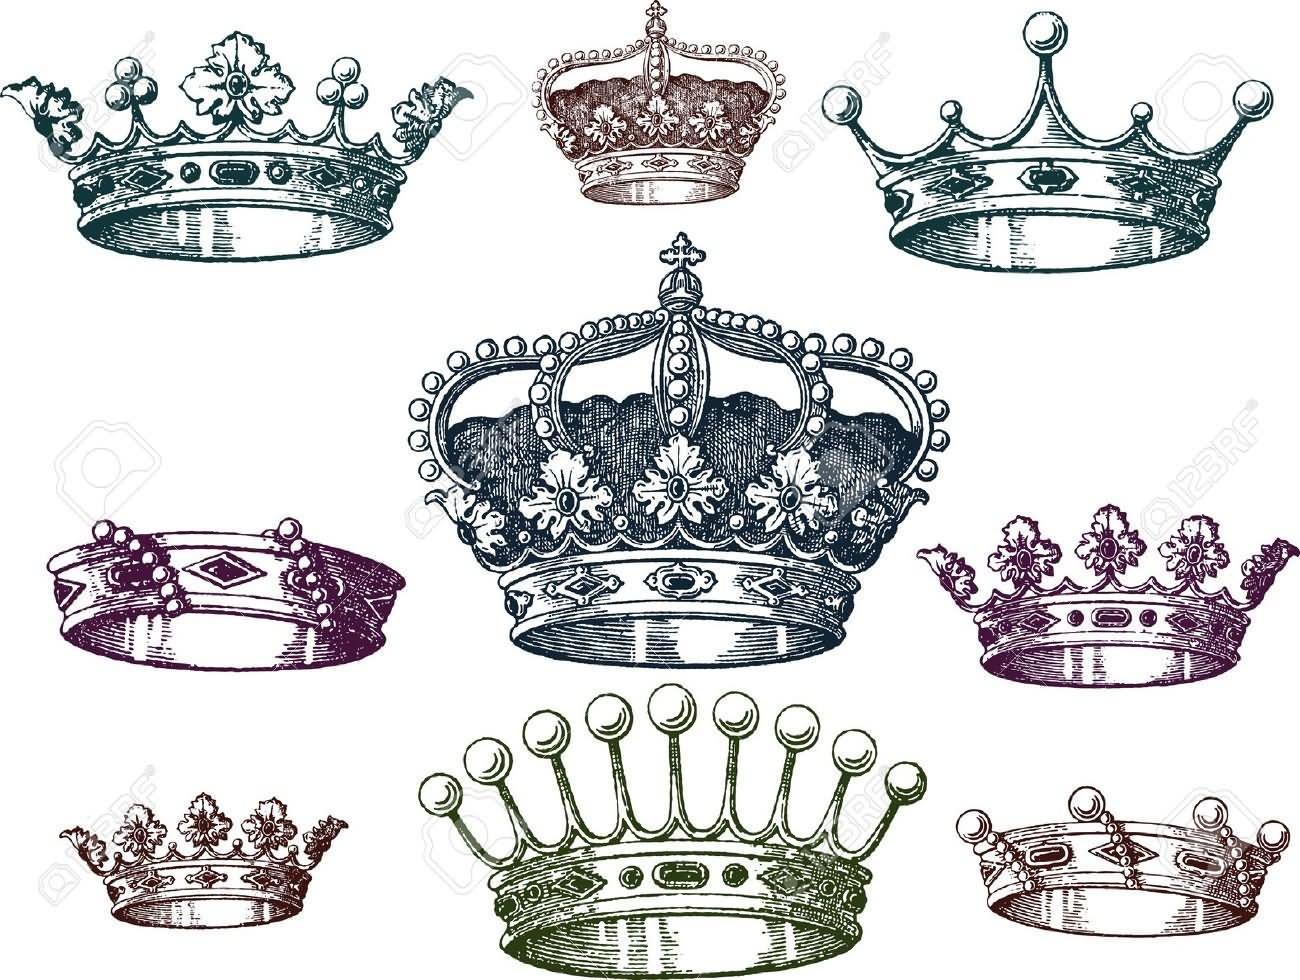 1300x980 Queen Crown Tattoo Designs